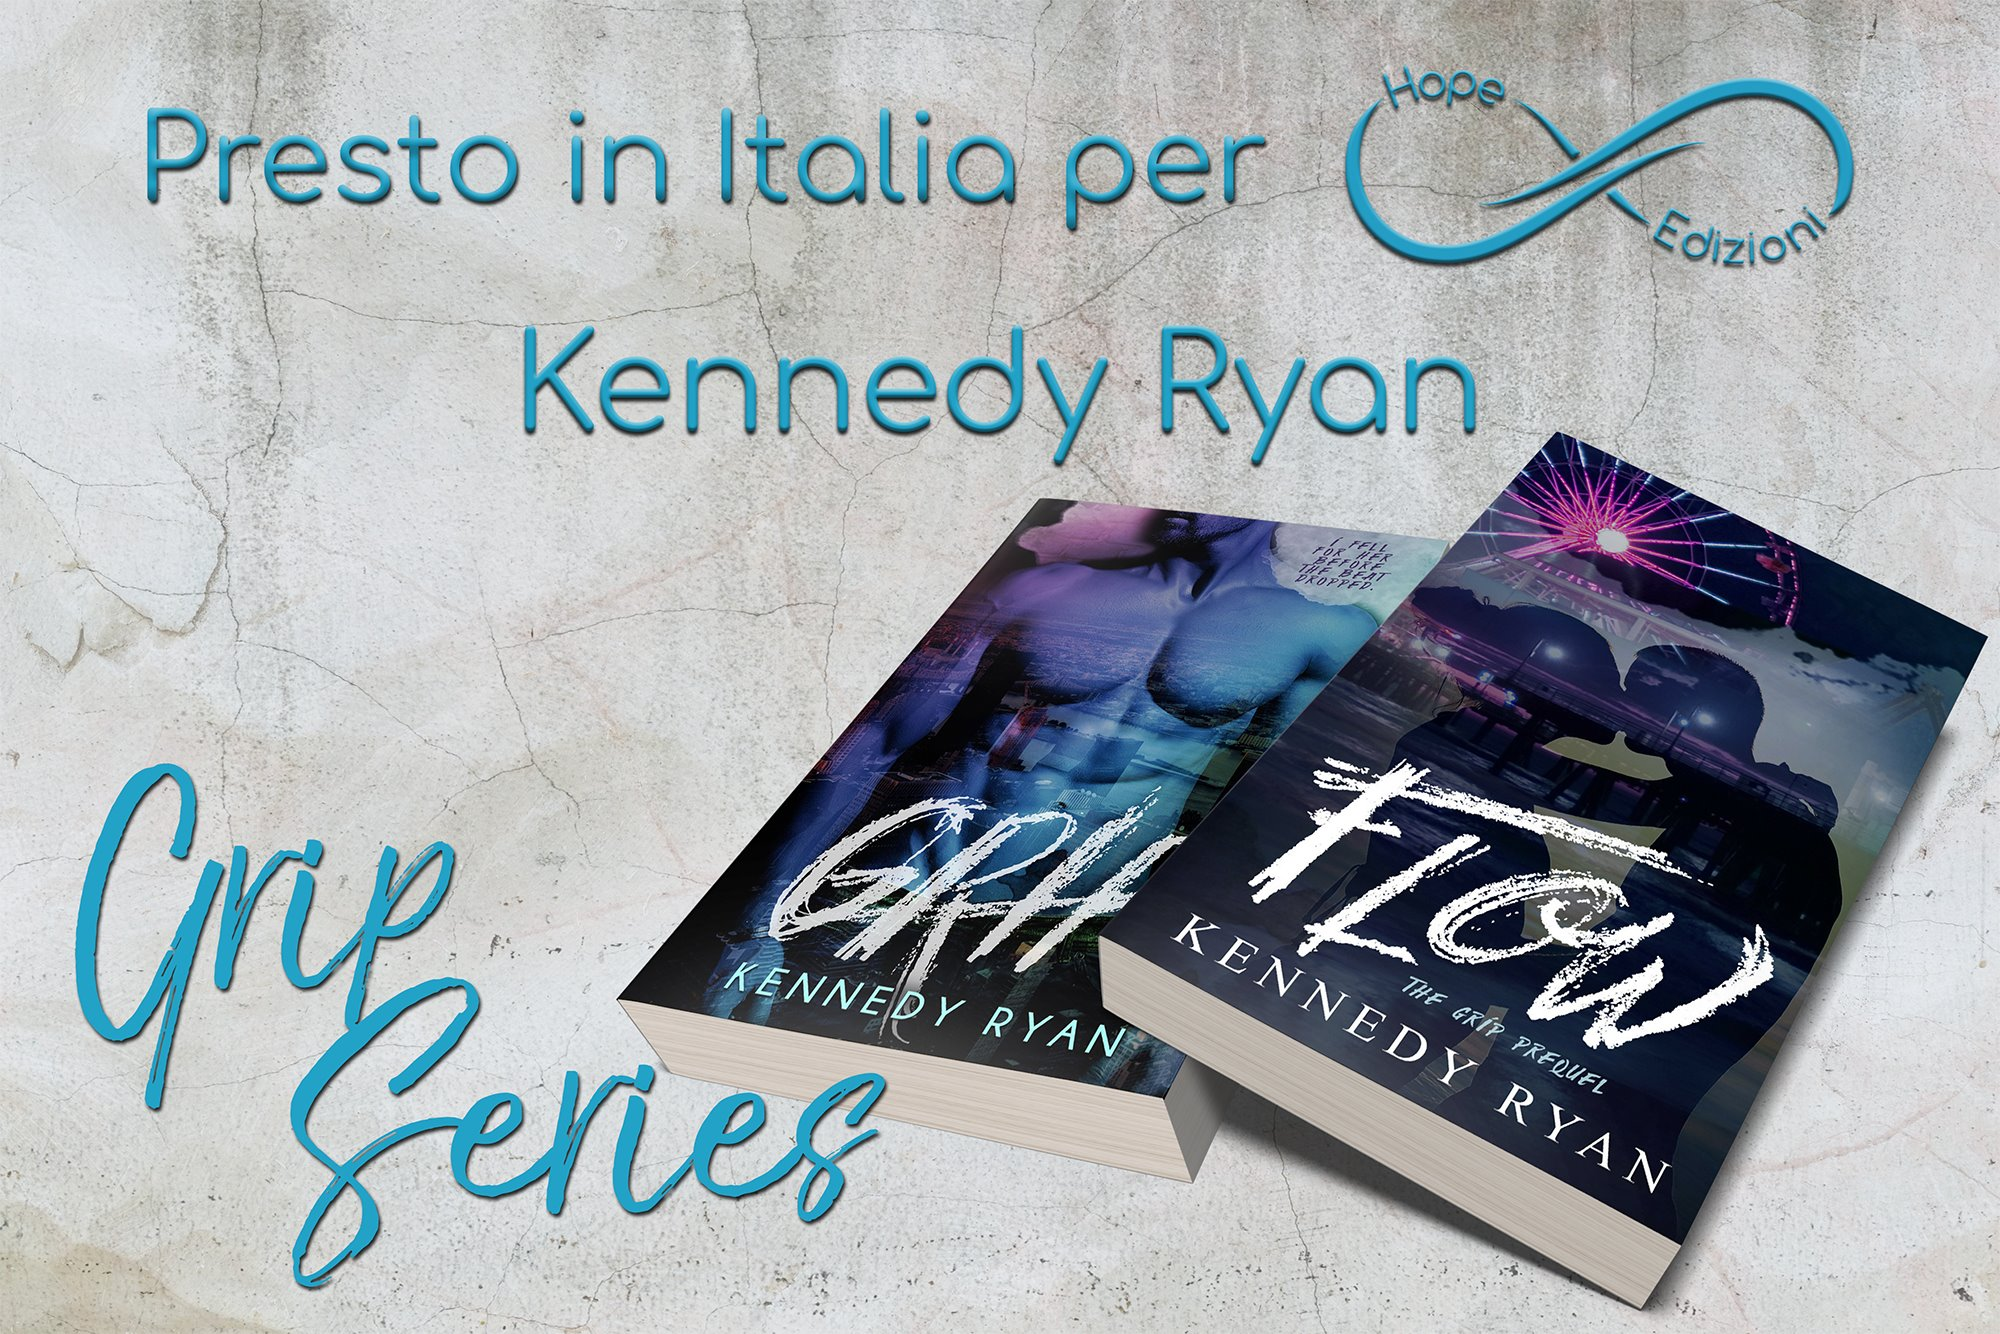 Presto in Italia… Kennedy Ryan!